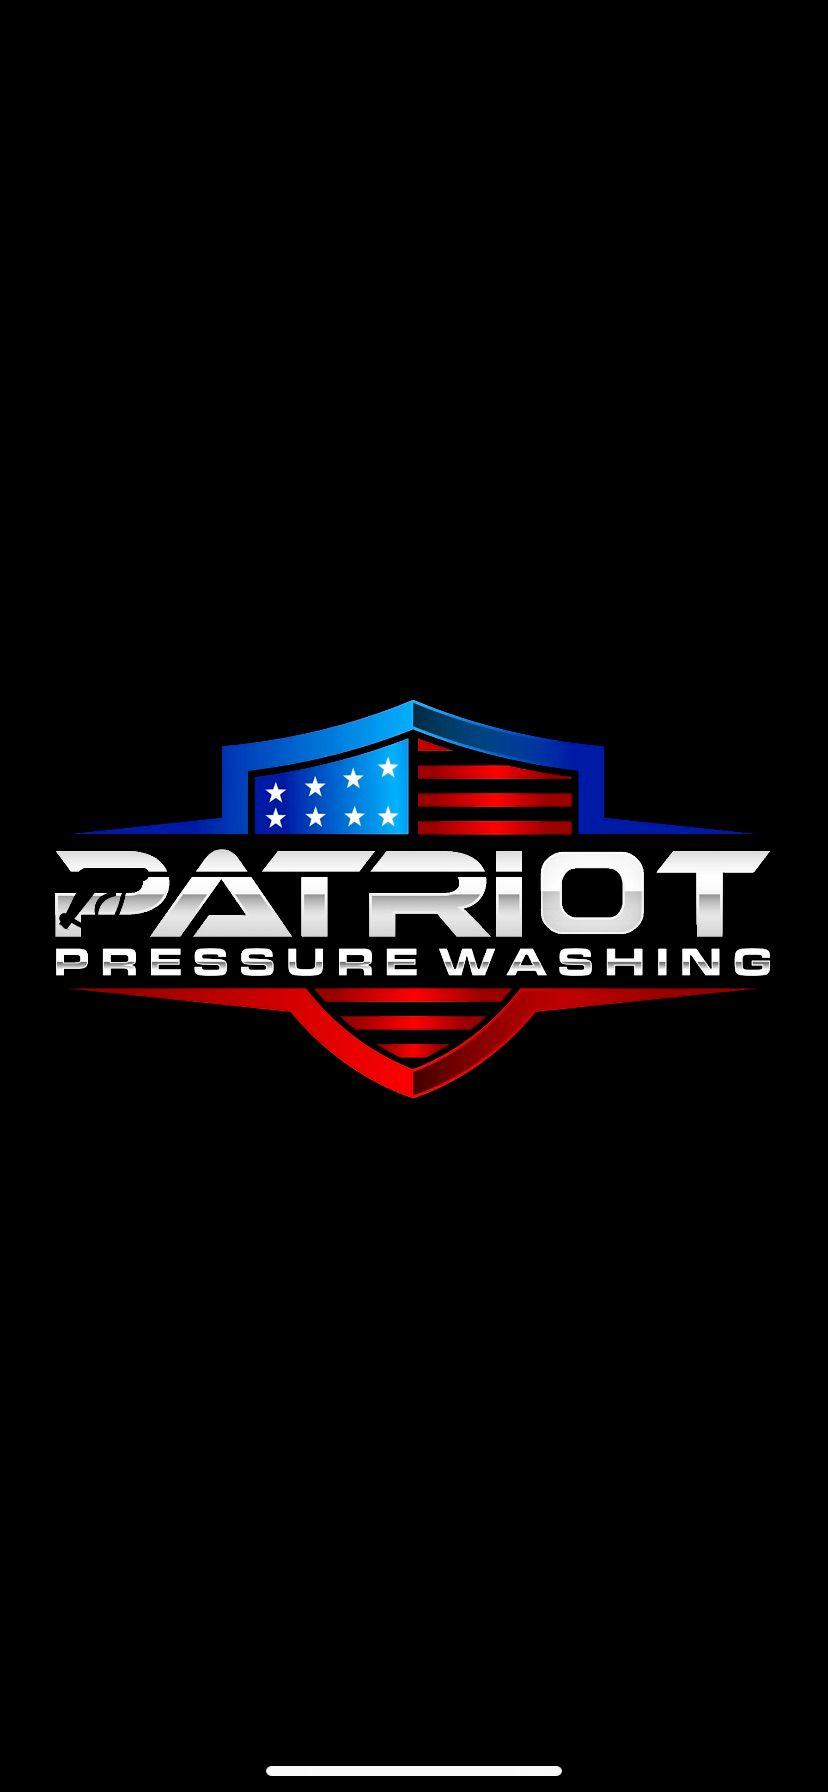 Patriot Pressure Washing